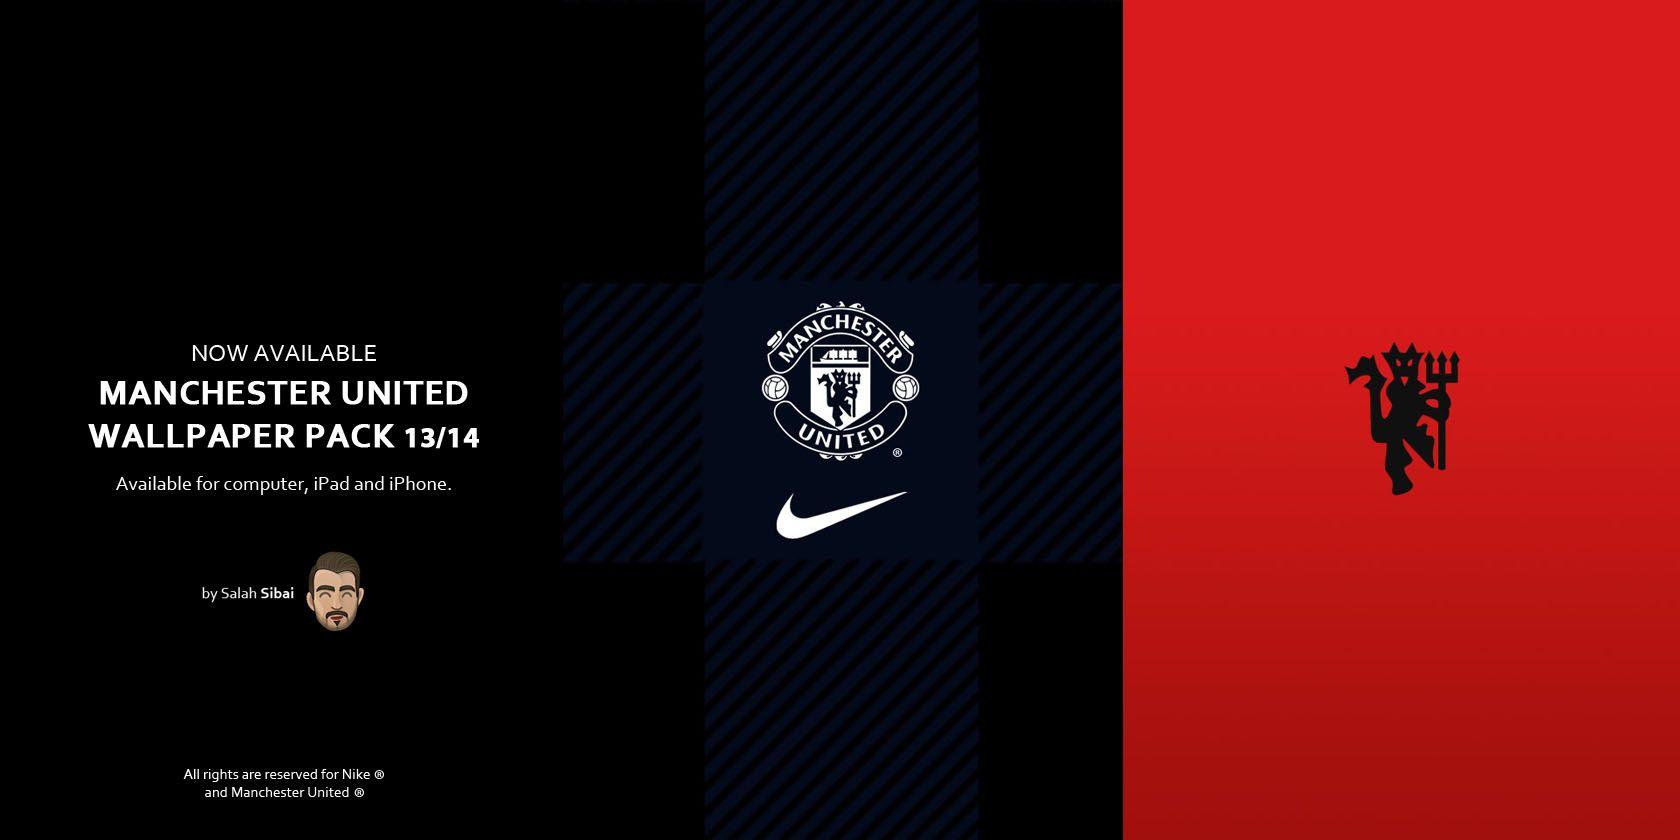 Get Latest Manchester United Wallpapers Deviantart Manchester United 13/14 Wallpaper Collection by salah-sibai.deviantart.com on @deviantART